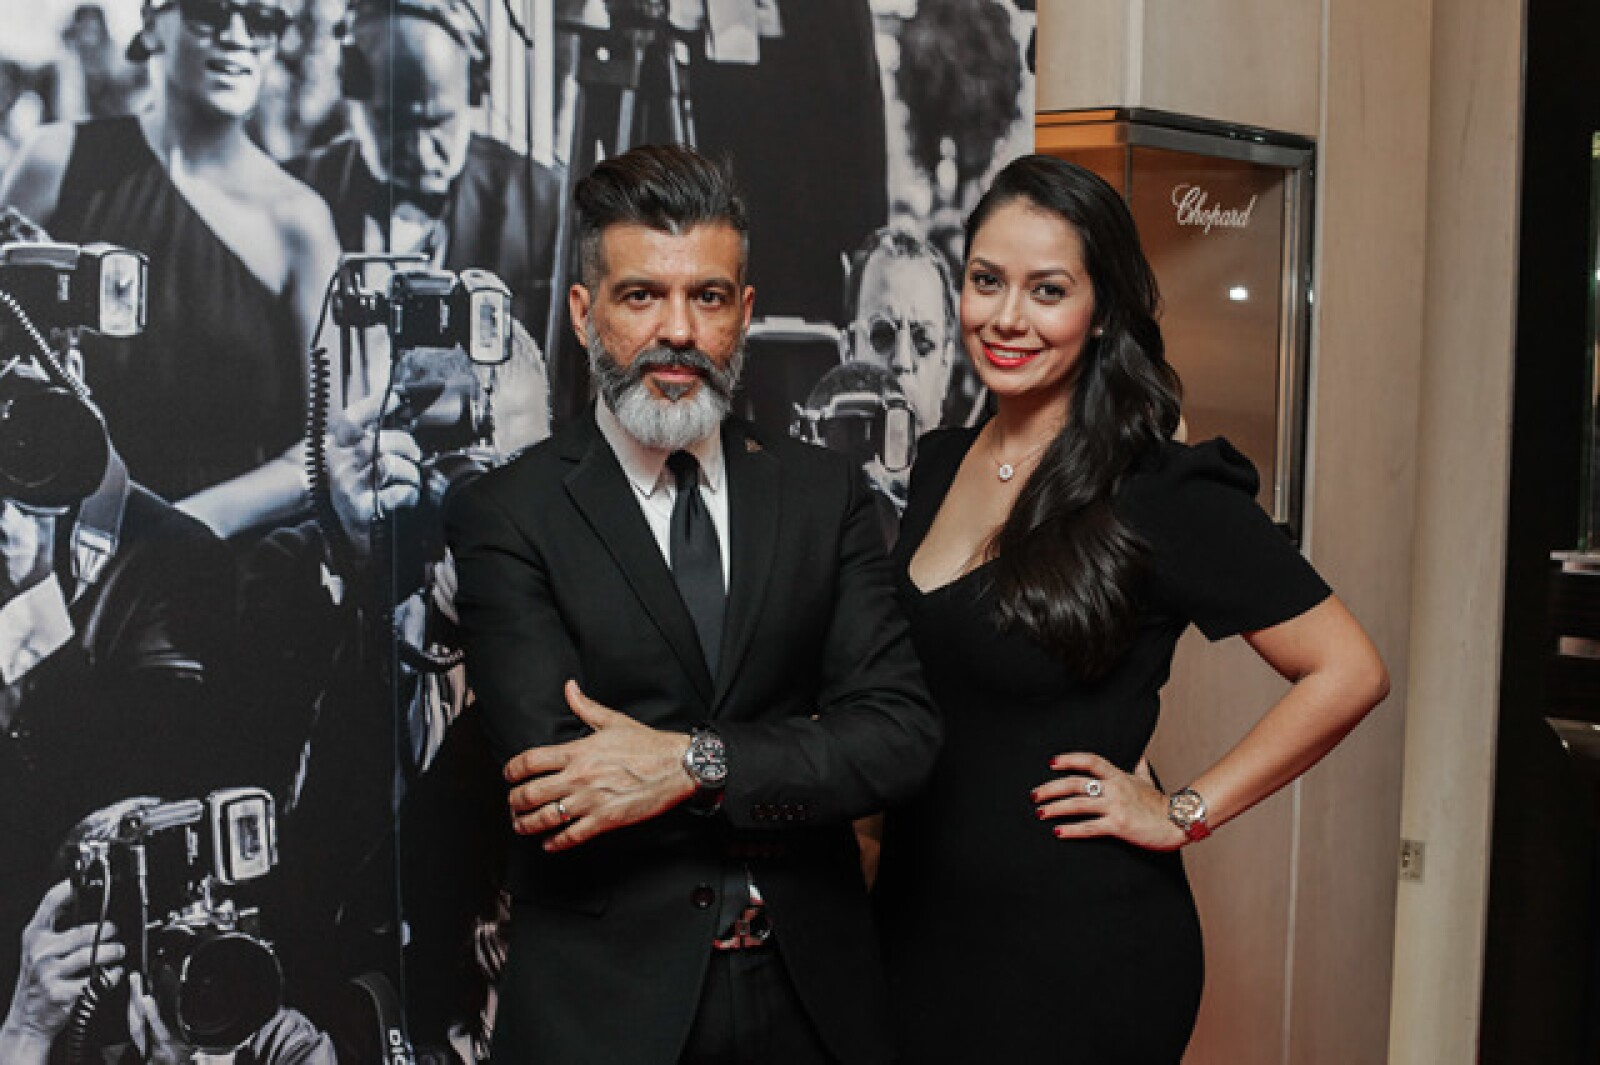 Lorenzo Rivero y Anielka Sandoval